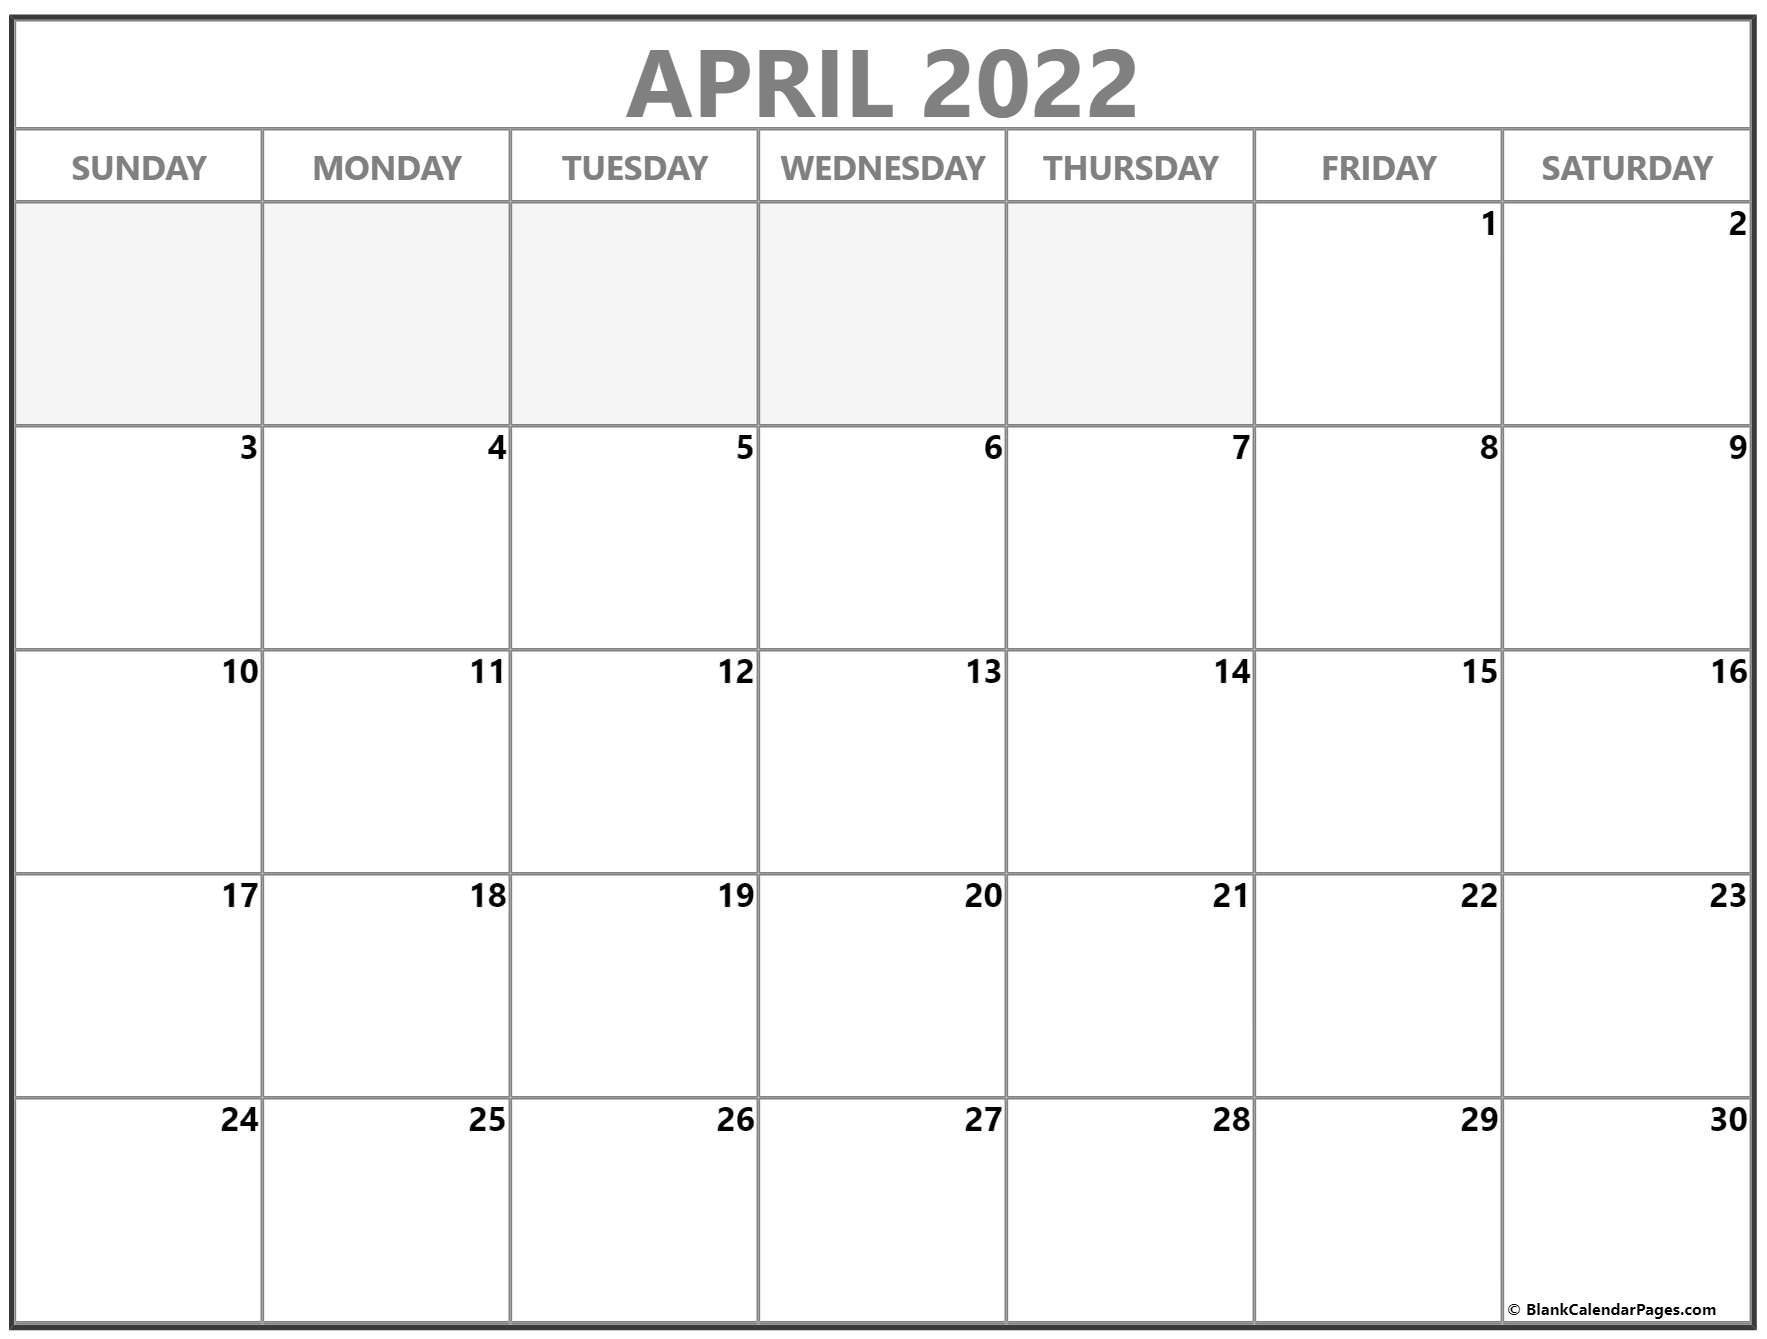 April 2022 Calendar   Free Printable Calendar Templates within April May Calendar 2022 Printable